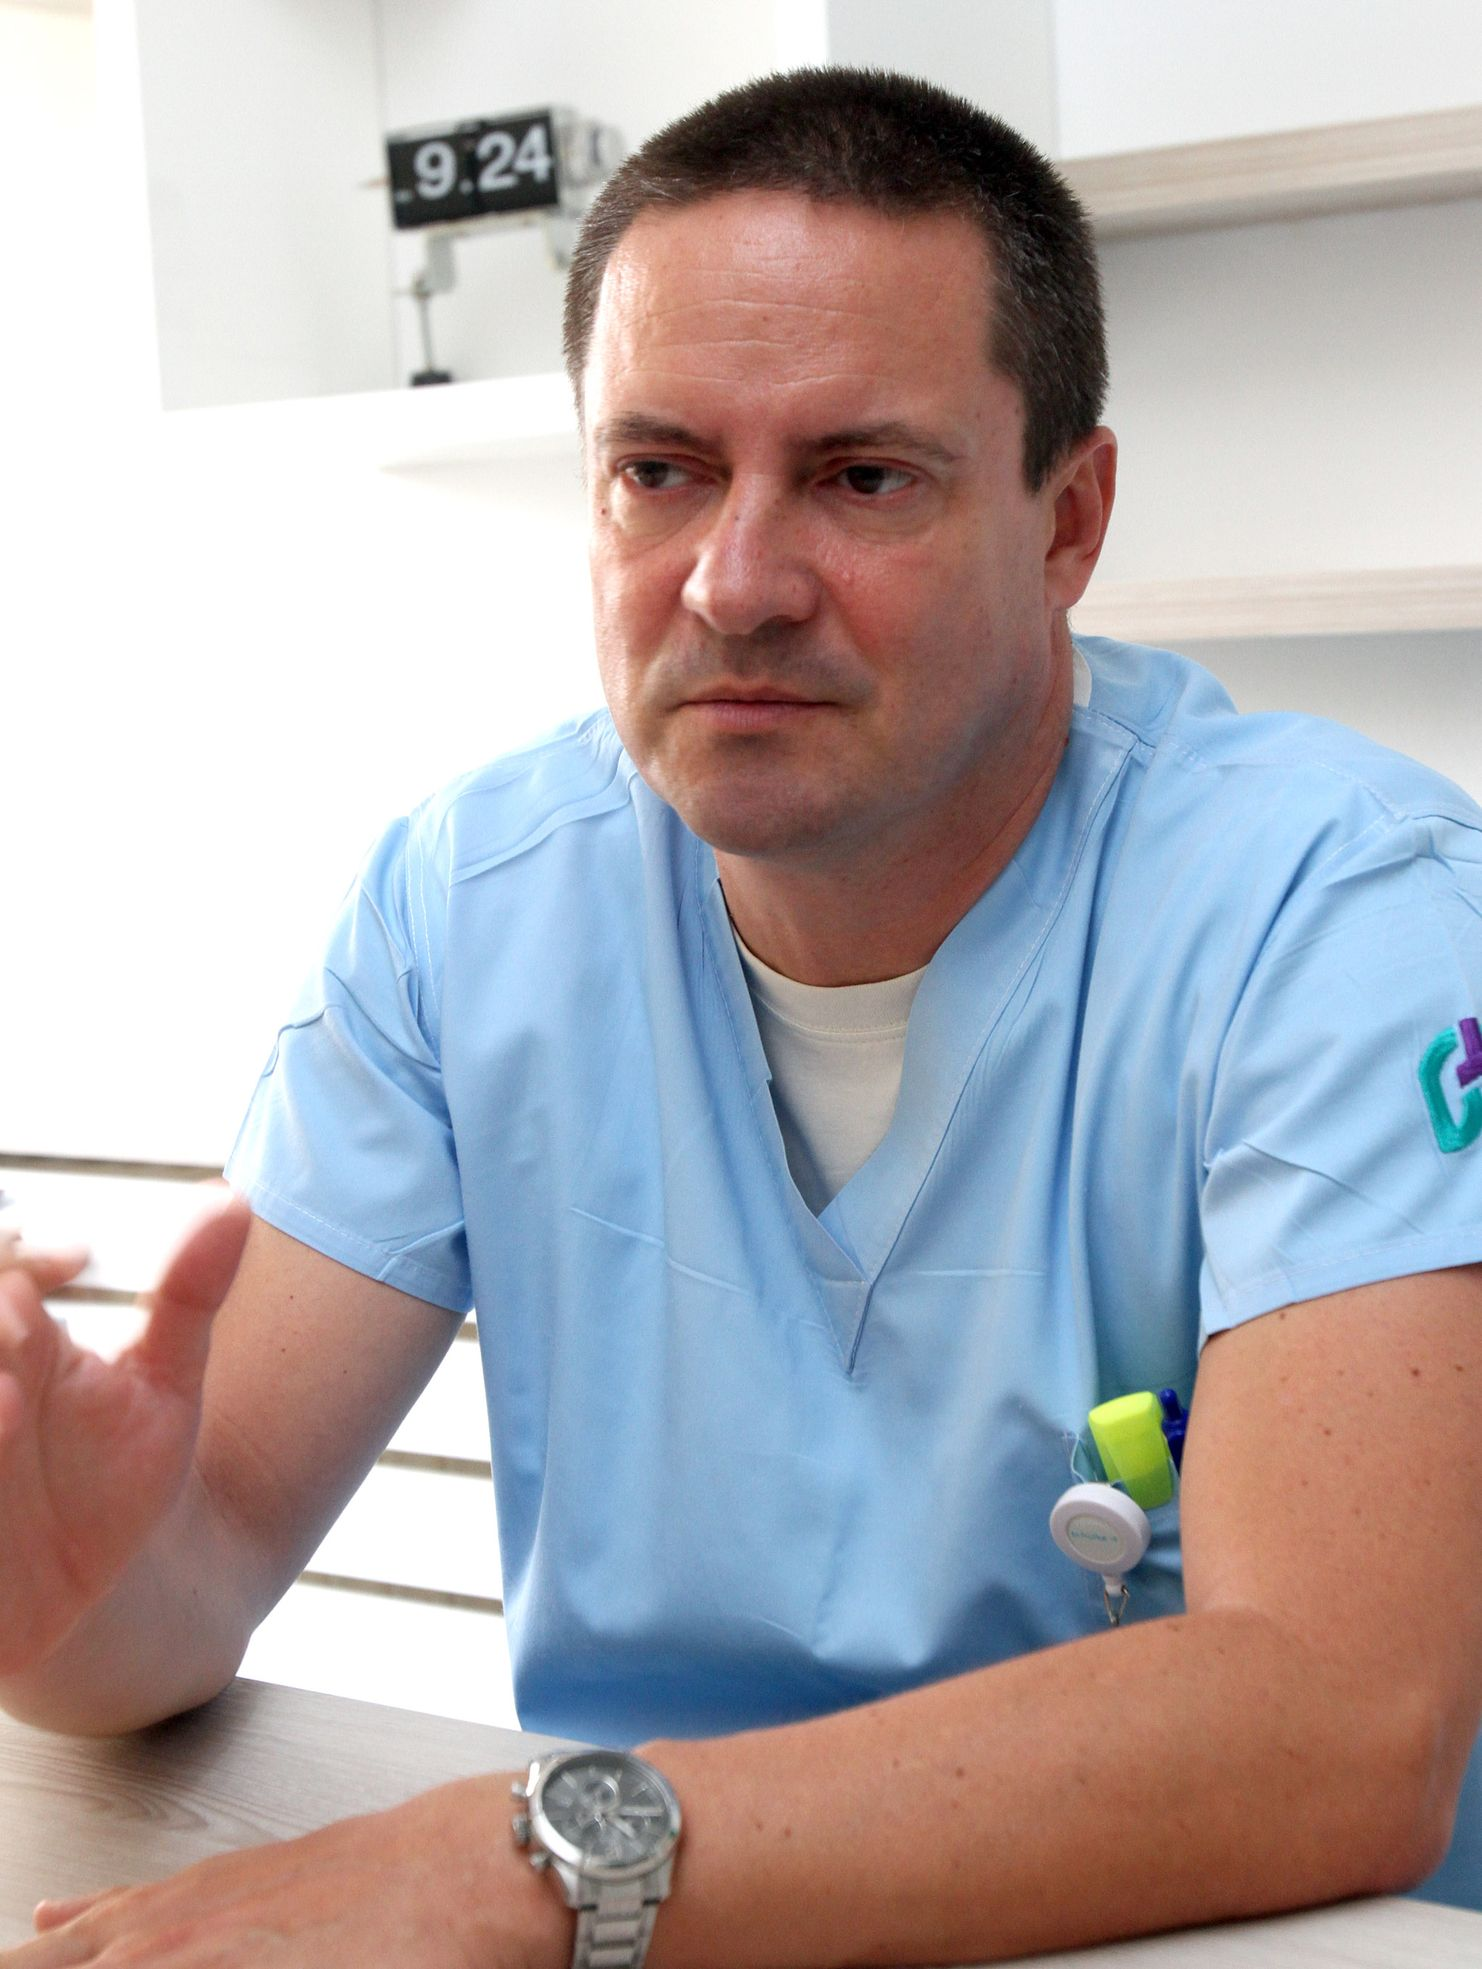 dr jovan matijasevic, Dnevnik/Branko Lučić